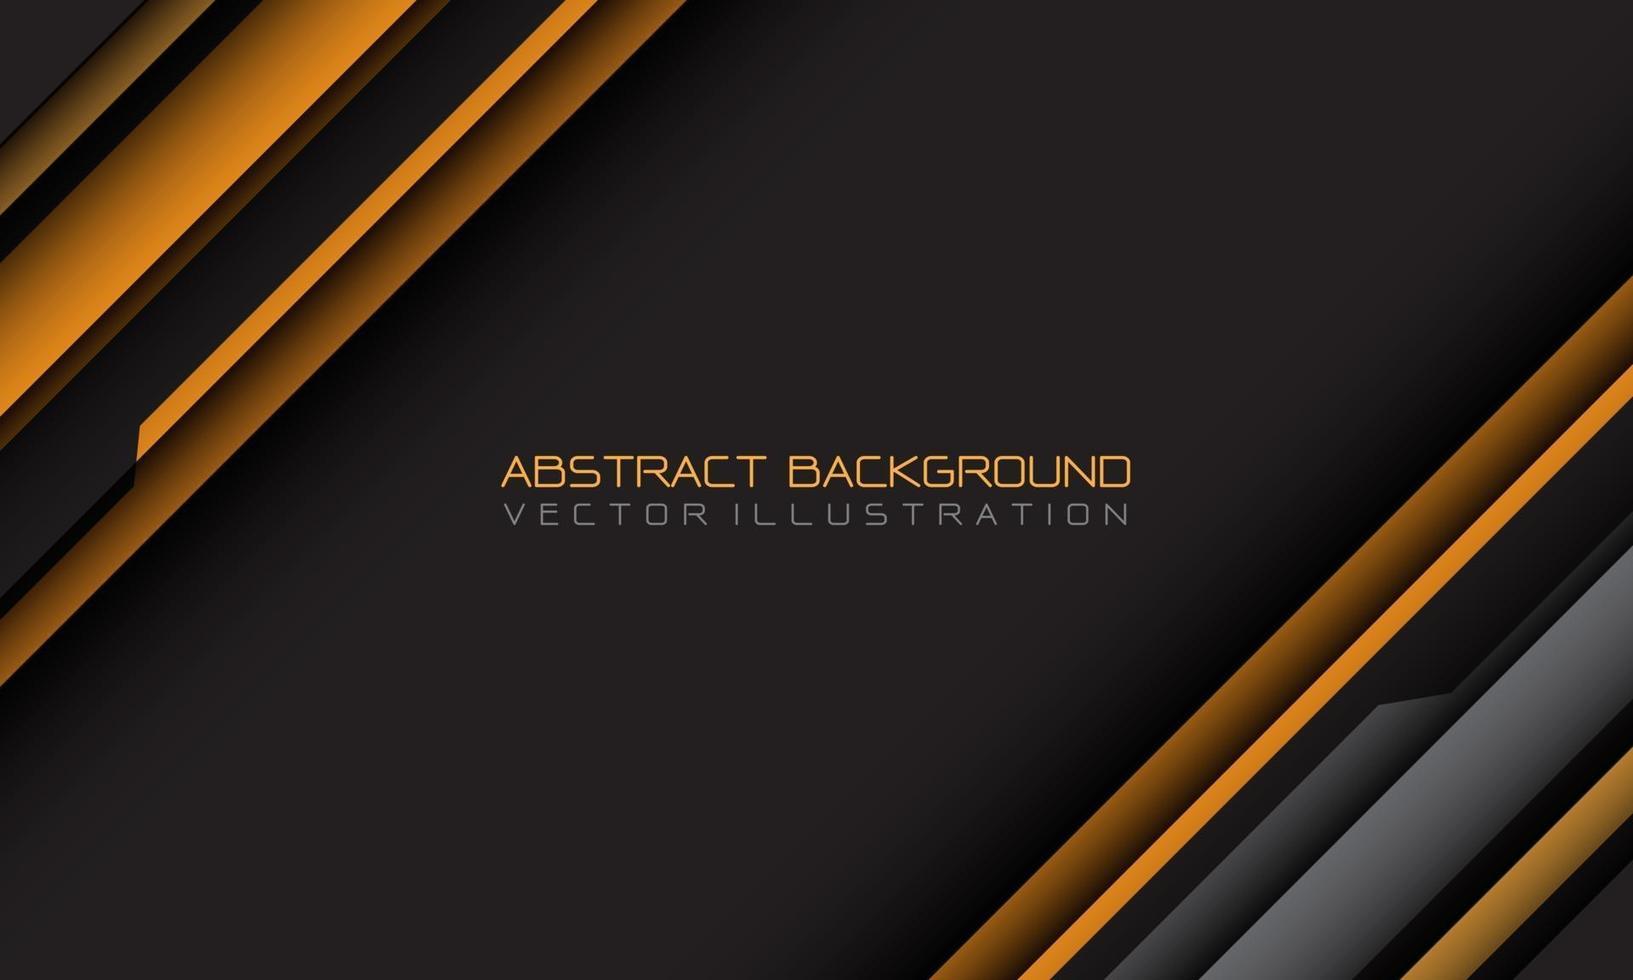 abstrakt gul grå cyber geometrisk snedstreck med tomt utrymme och text design modern futuristisk bakgrund vektorillustration. vektor